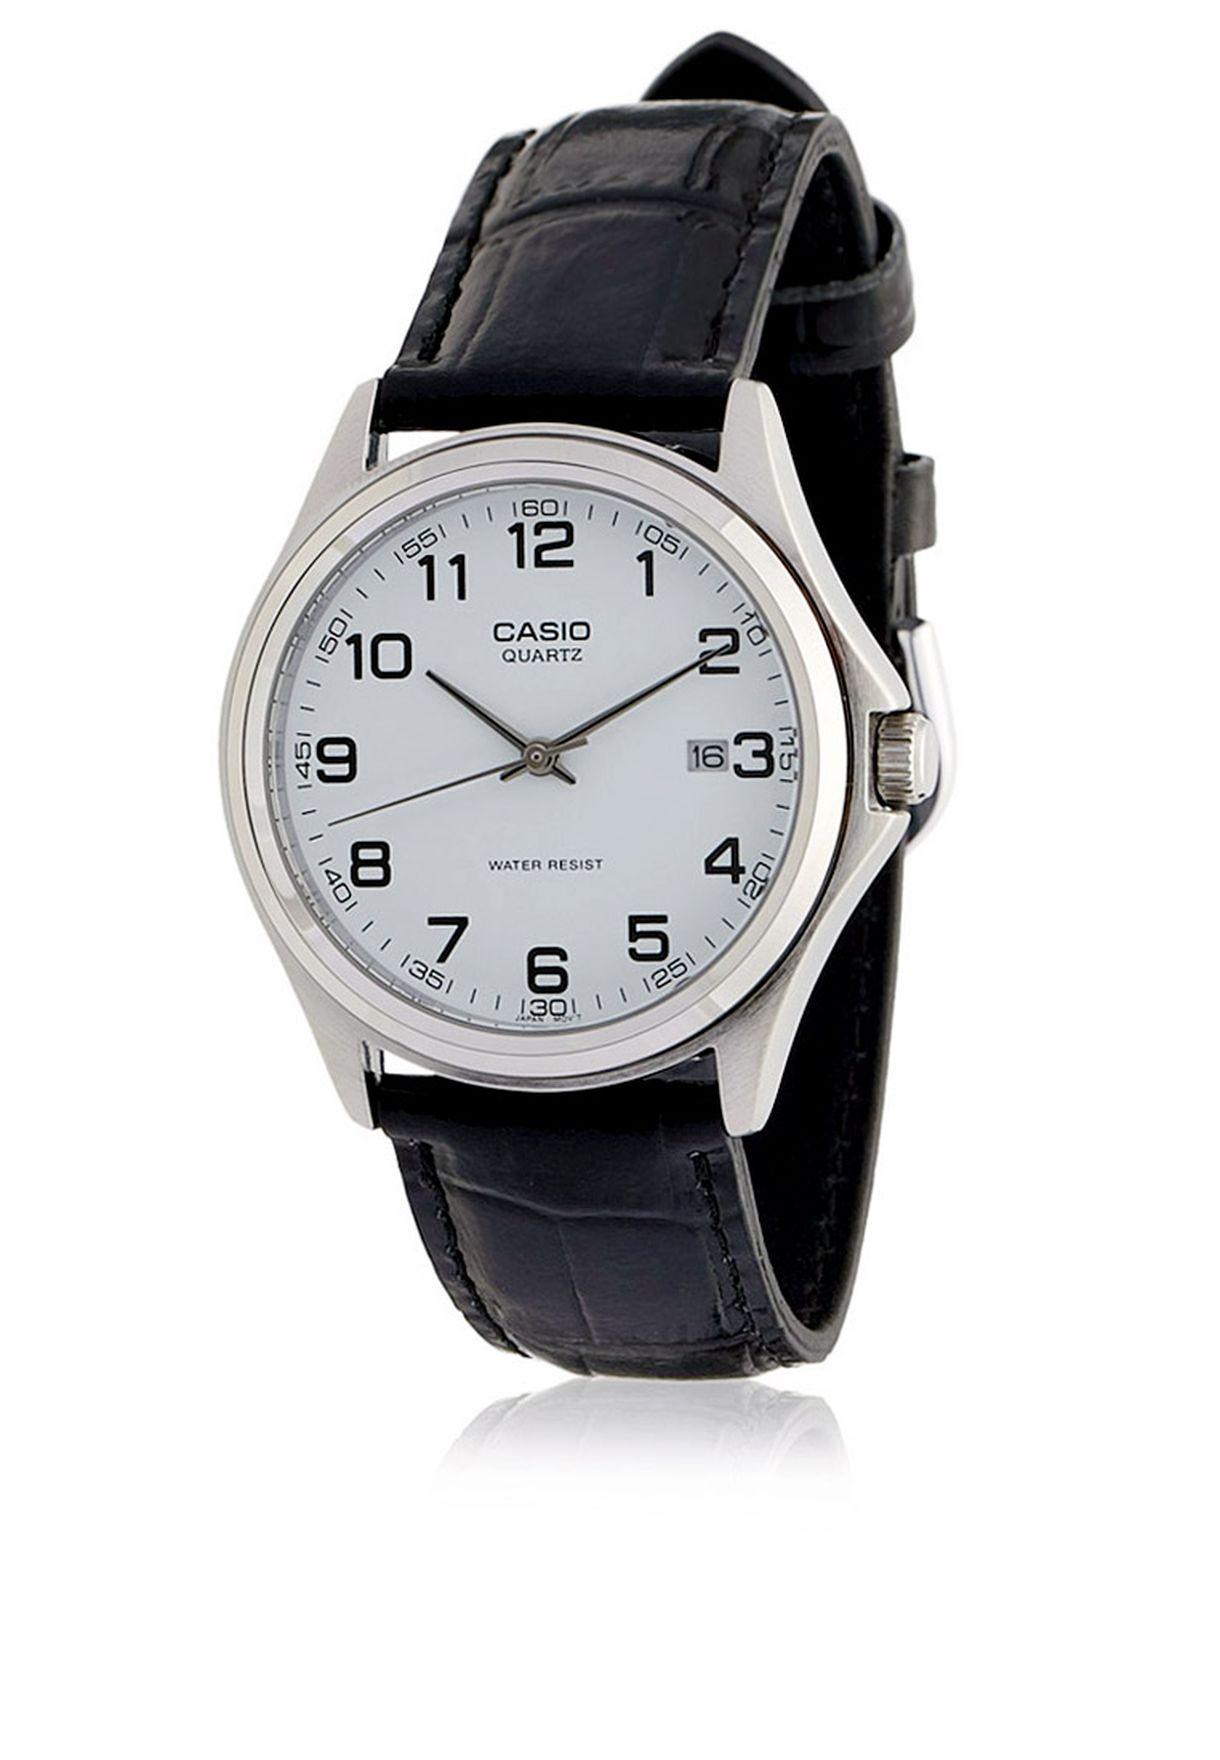 9bca9d436 تسوق ساعة يد رسمية ماركة كاسيو لون أسود في السعودية - CA511AC39SRW